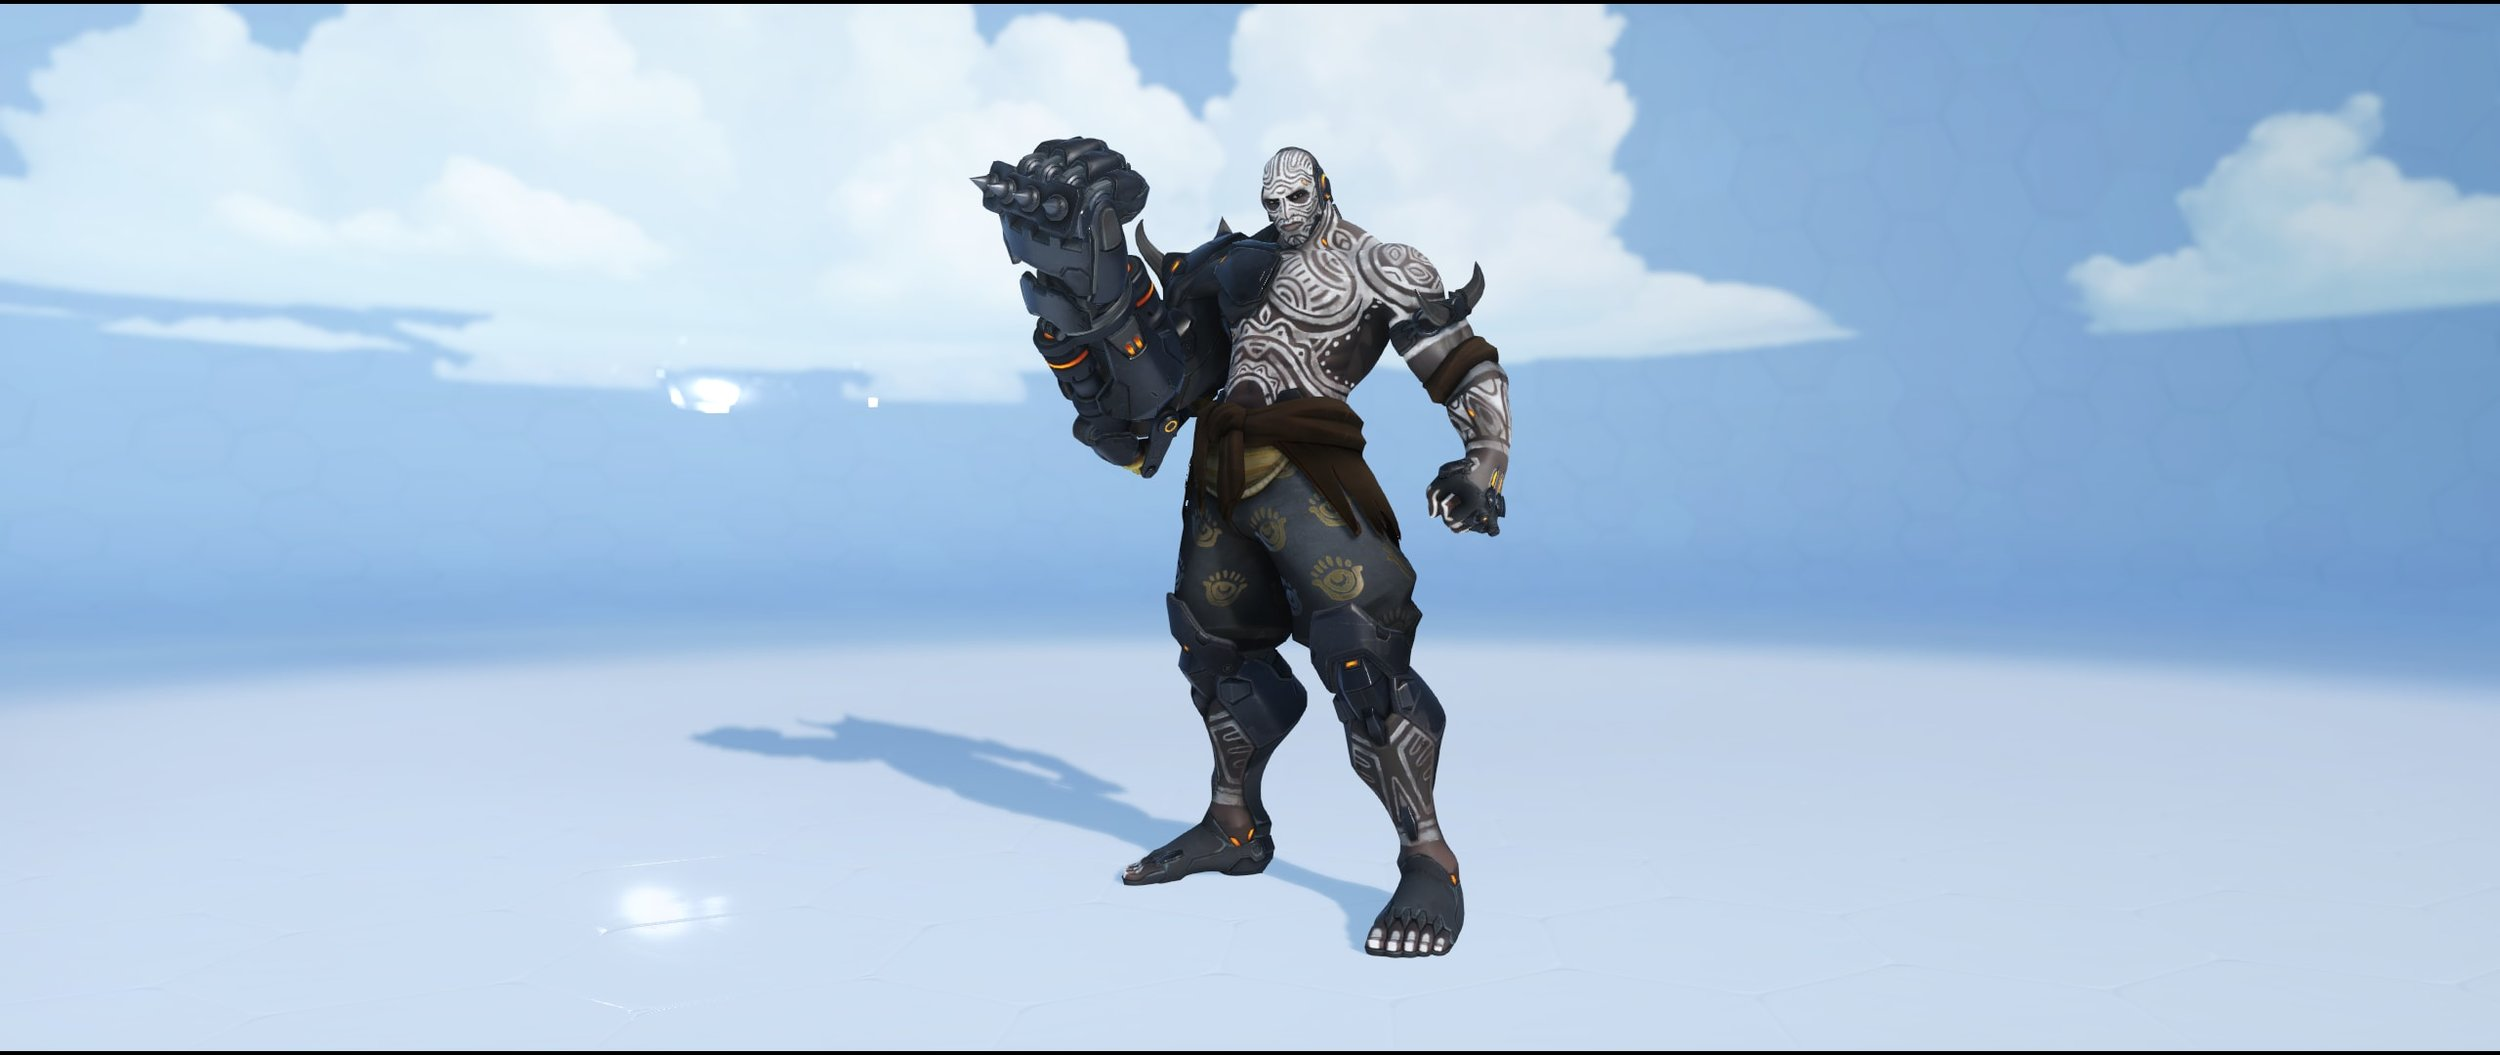 Painted front epic skin Doomfist Overwatch.jpg